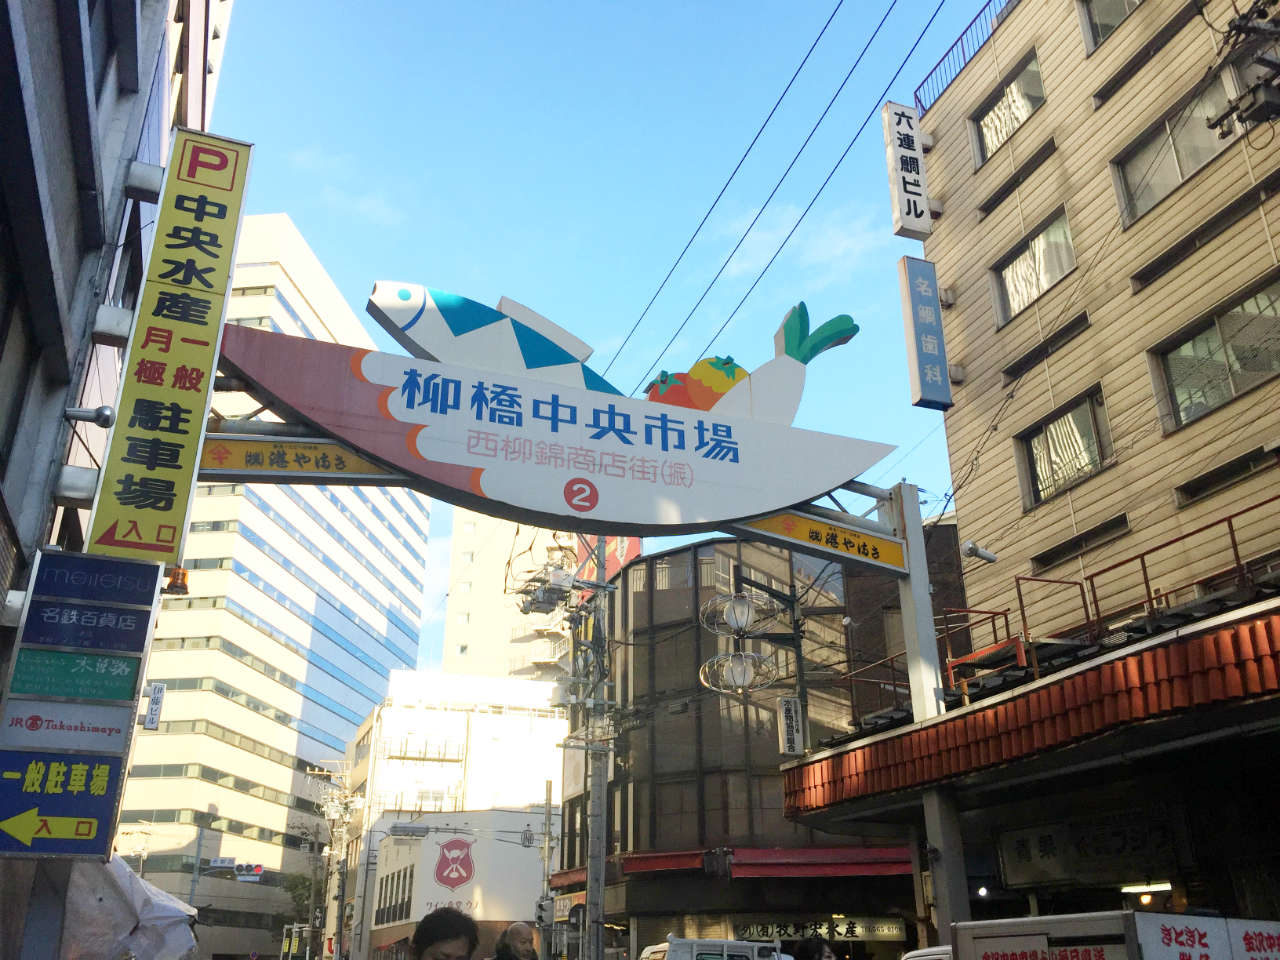 nagoya_sarashina_shiyou3